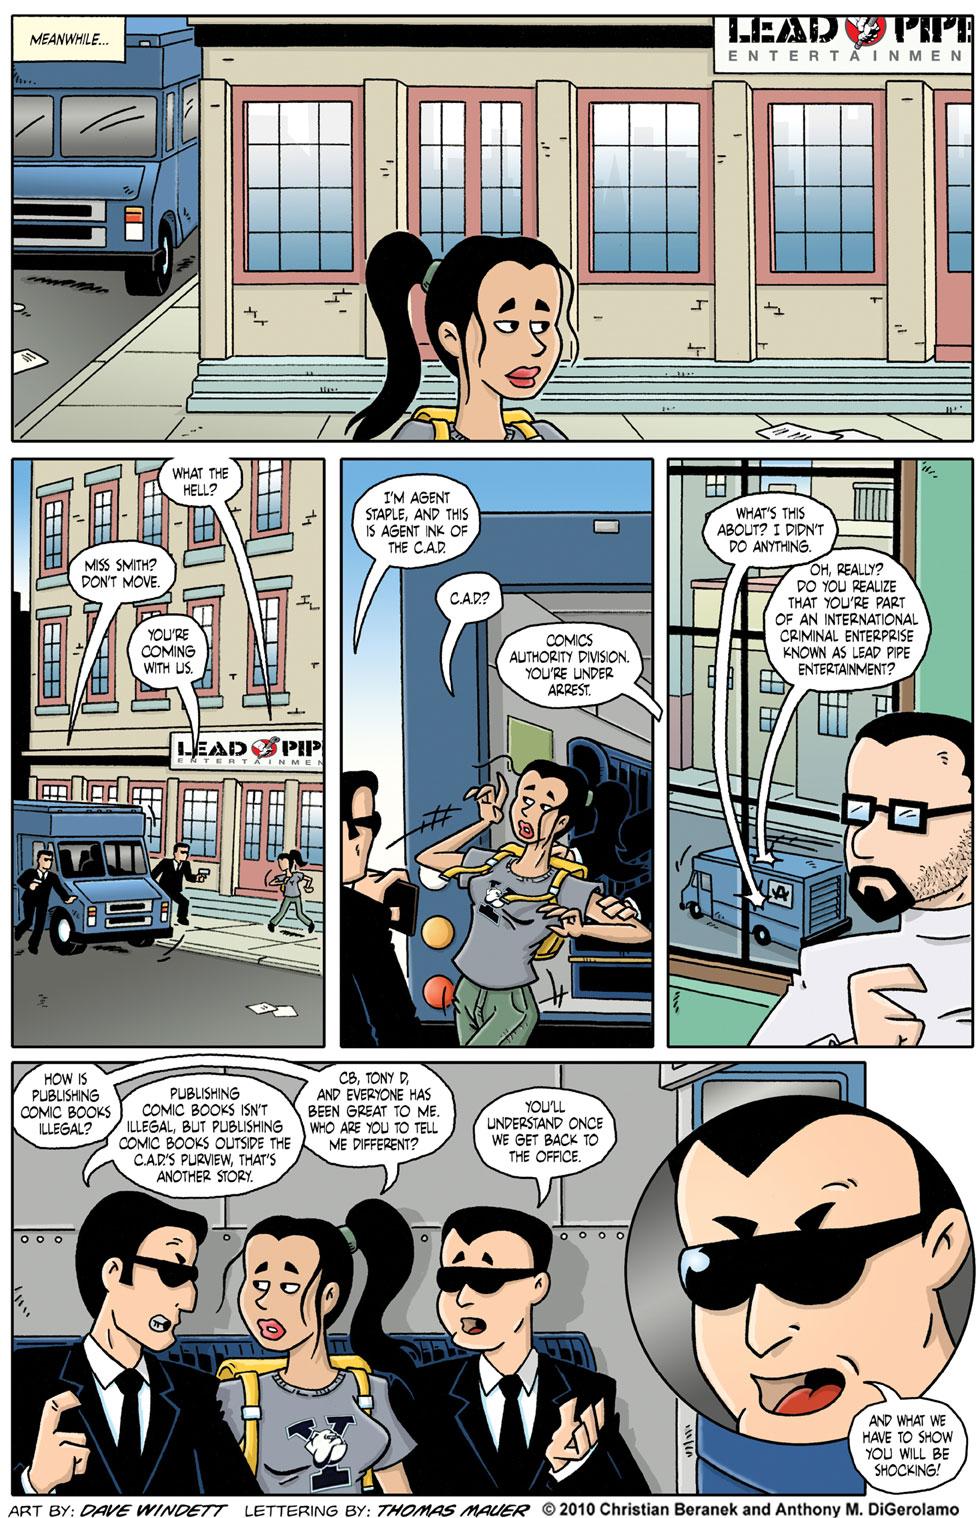 Comic Book Mafia: The Comics Authority Division